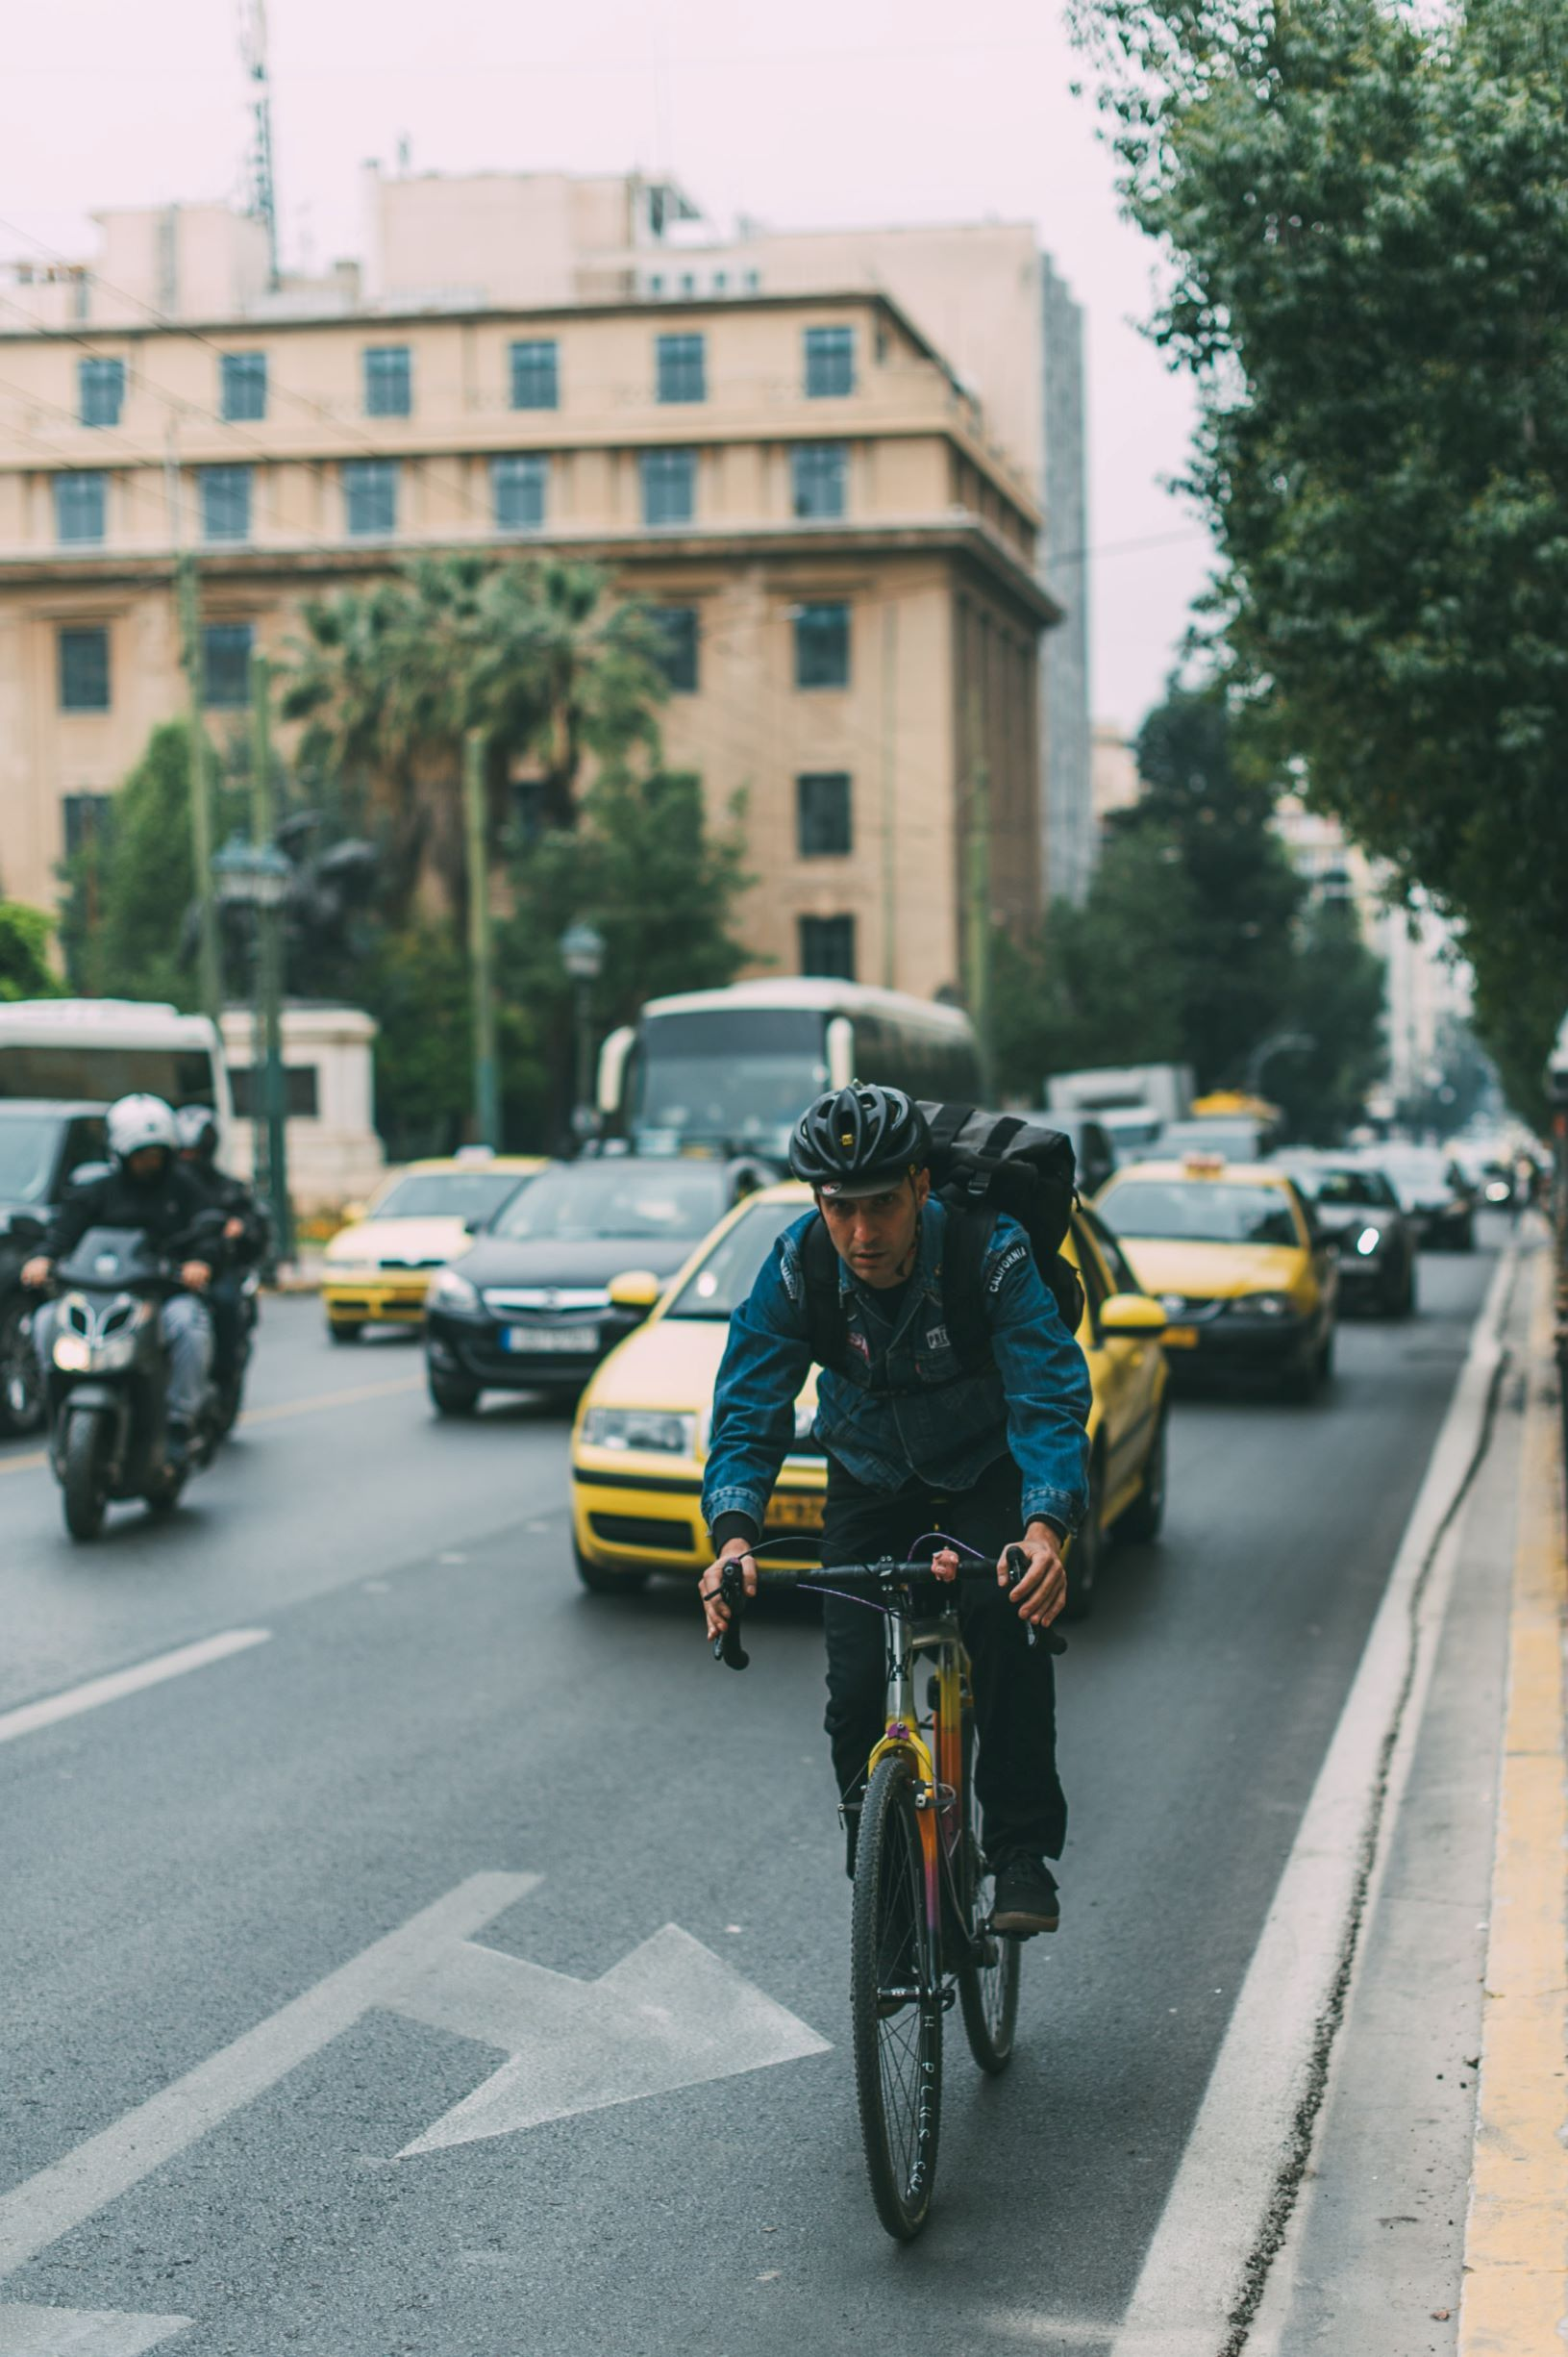 Photo of someone biking in the street